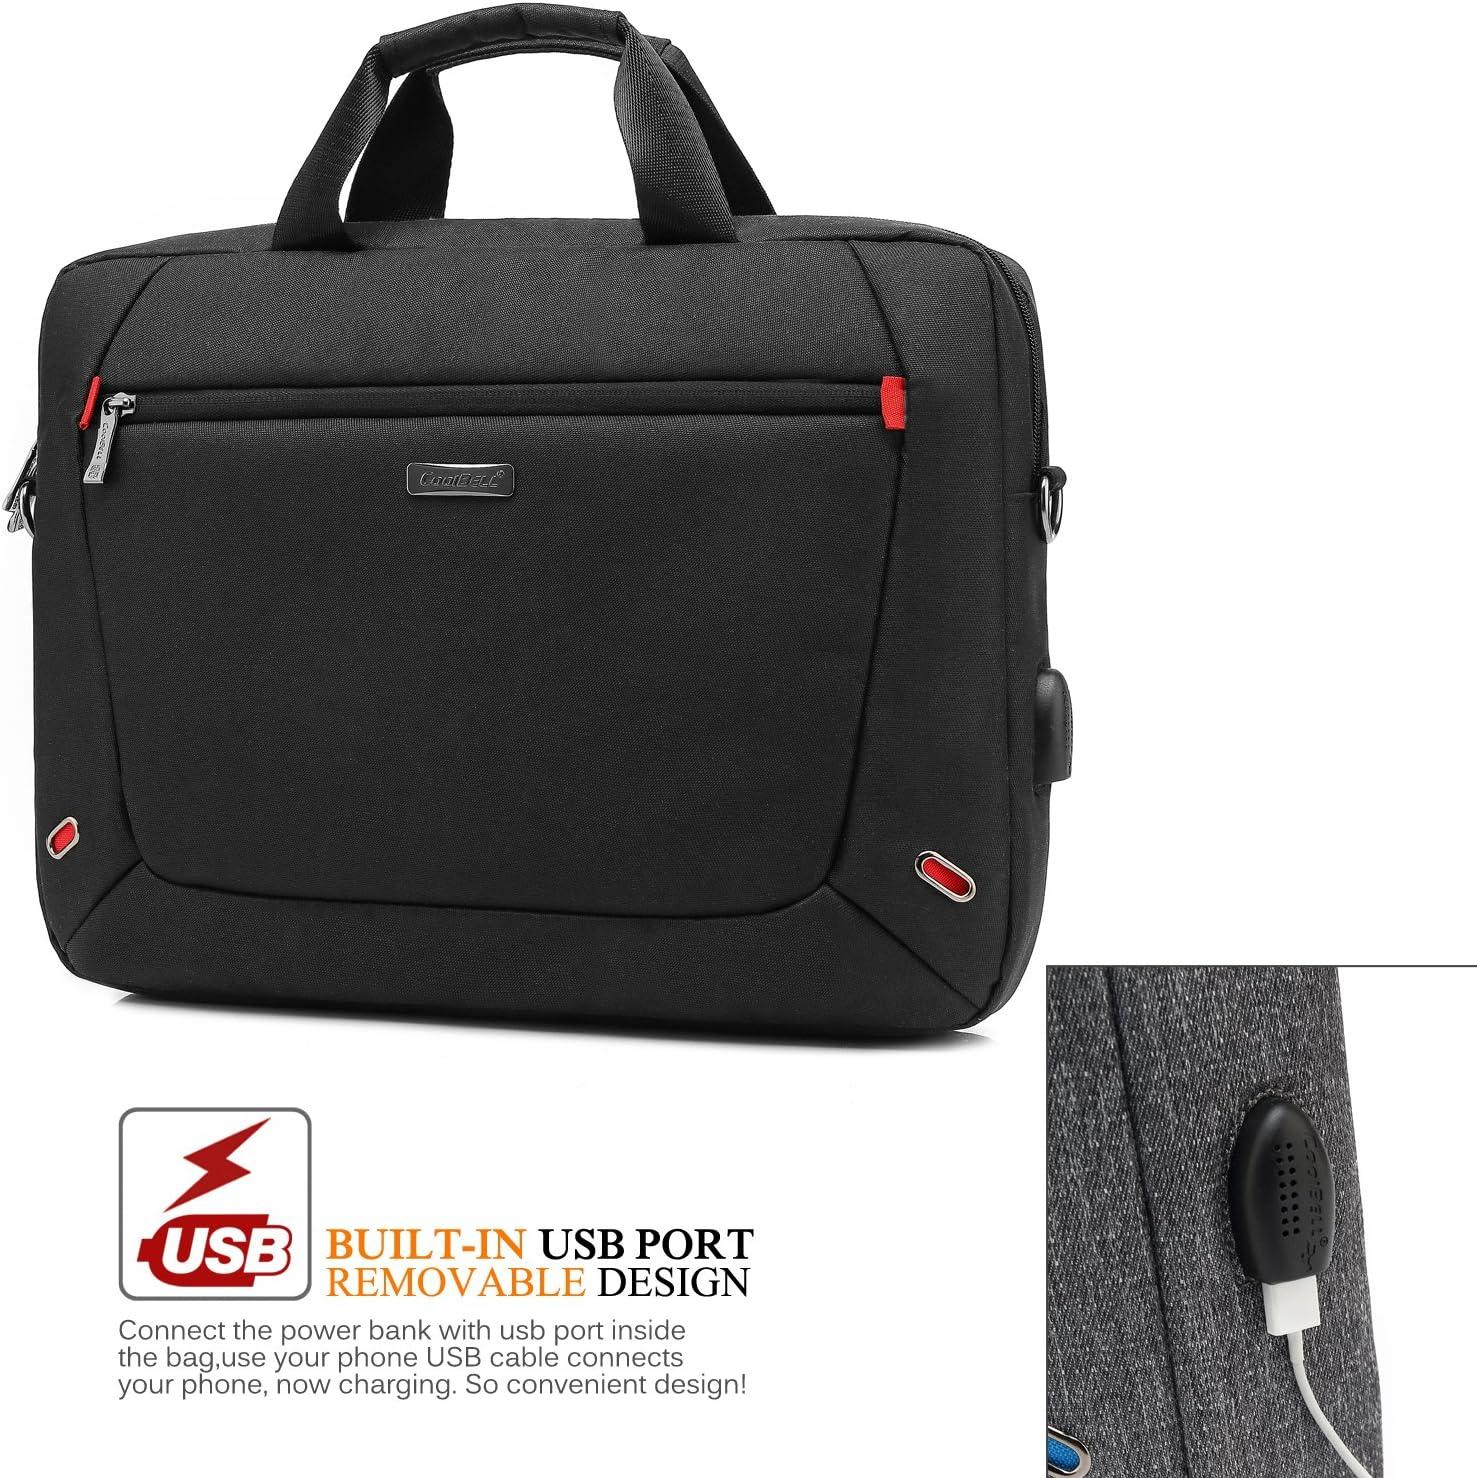 UTOTEBAG 17,3 Zoll Laptop Tasche Businesstasche Umh/ängetasche Messenger Bag M/änner Notebooktasche Laptoptasche f/ür Notebook Computer Business Aktentasche Herren,Schwarz